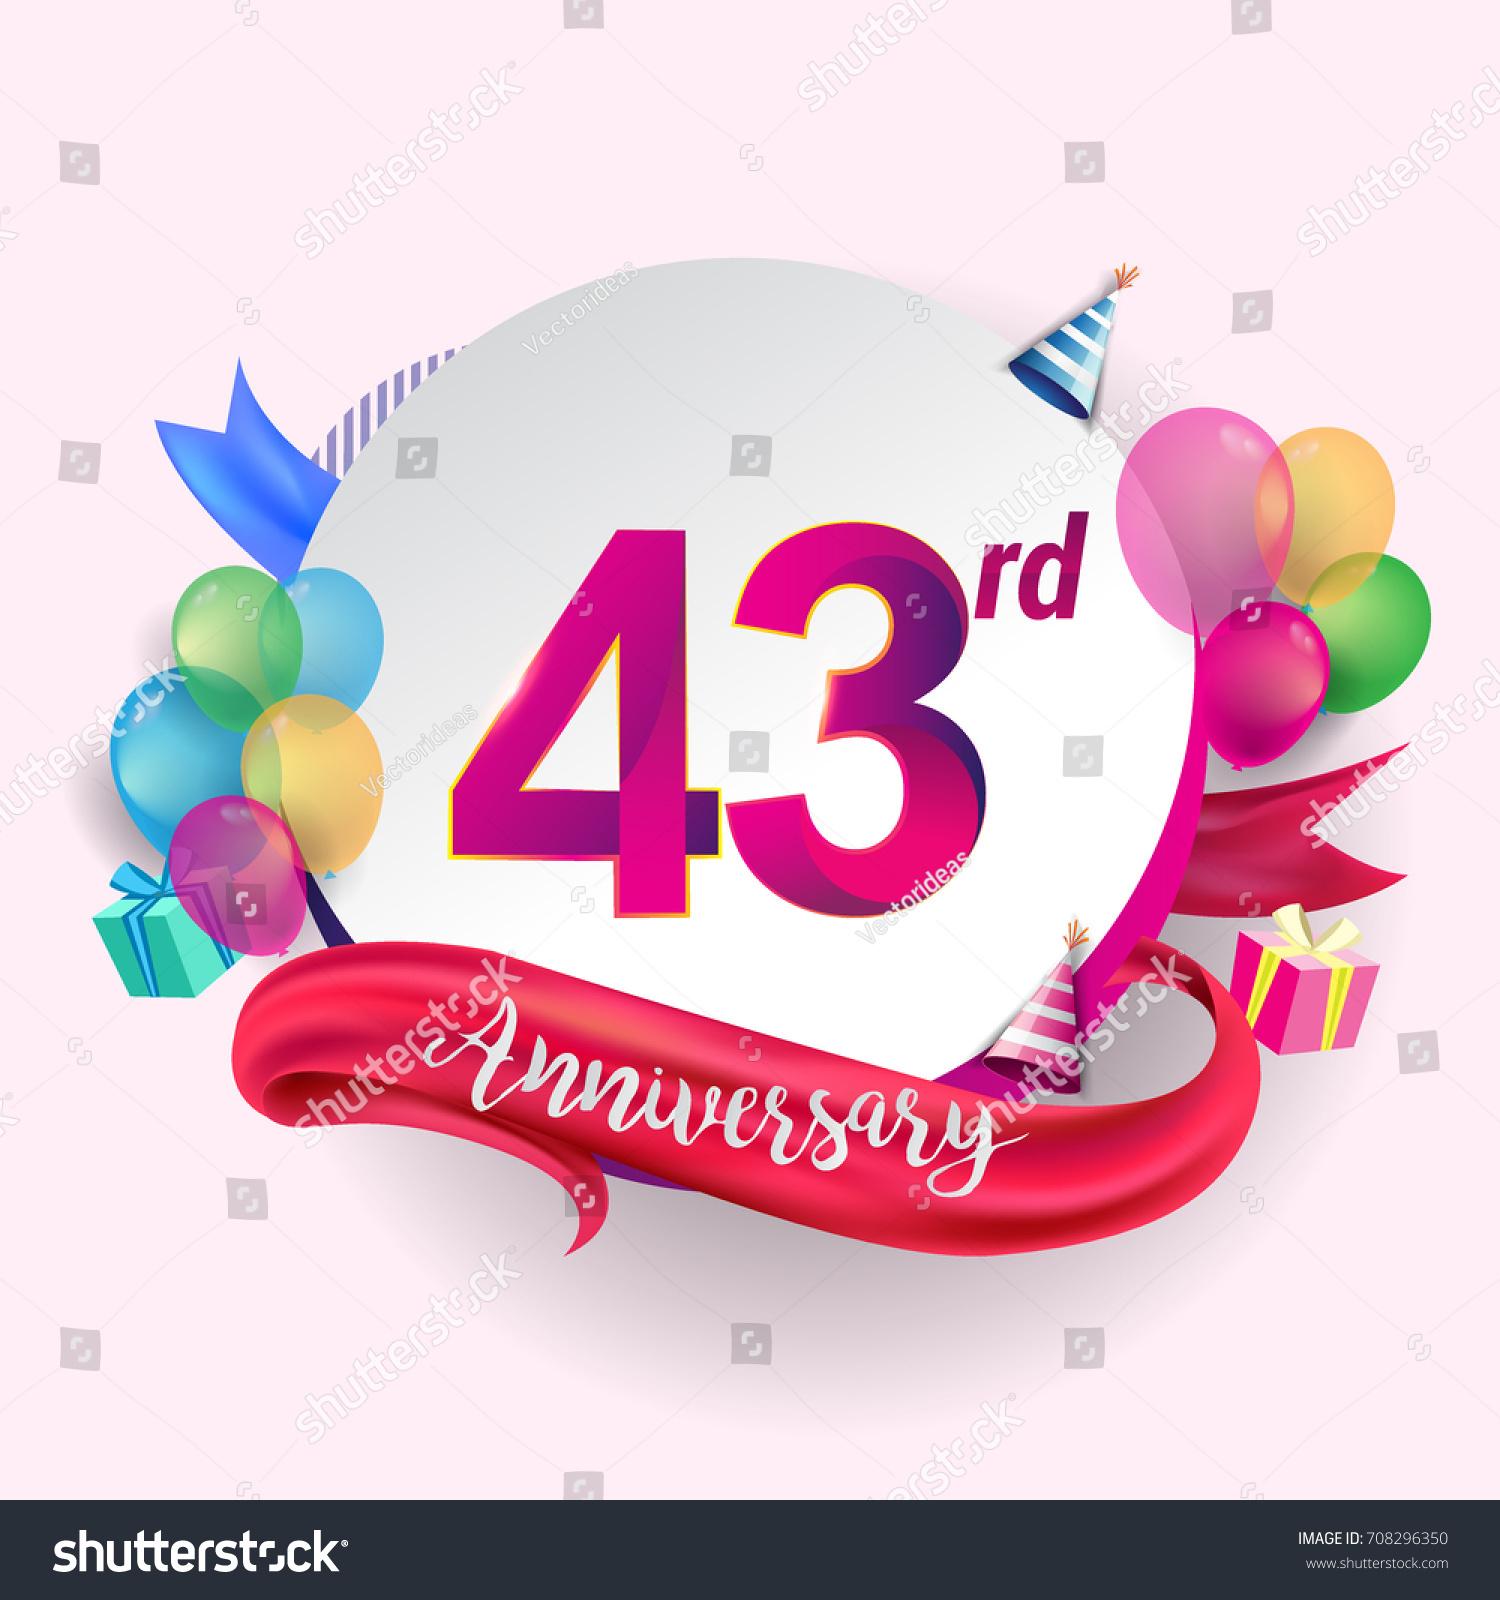 43rd Anniversary Logo Ribbon Balloon Gift Stock Vector Royalty Free